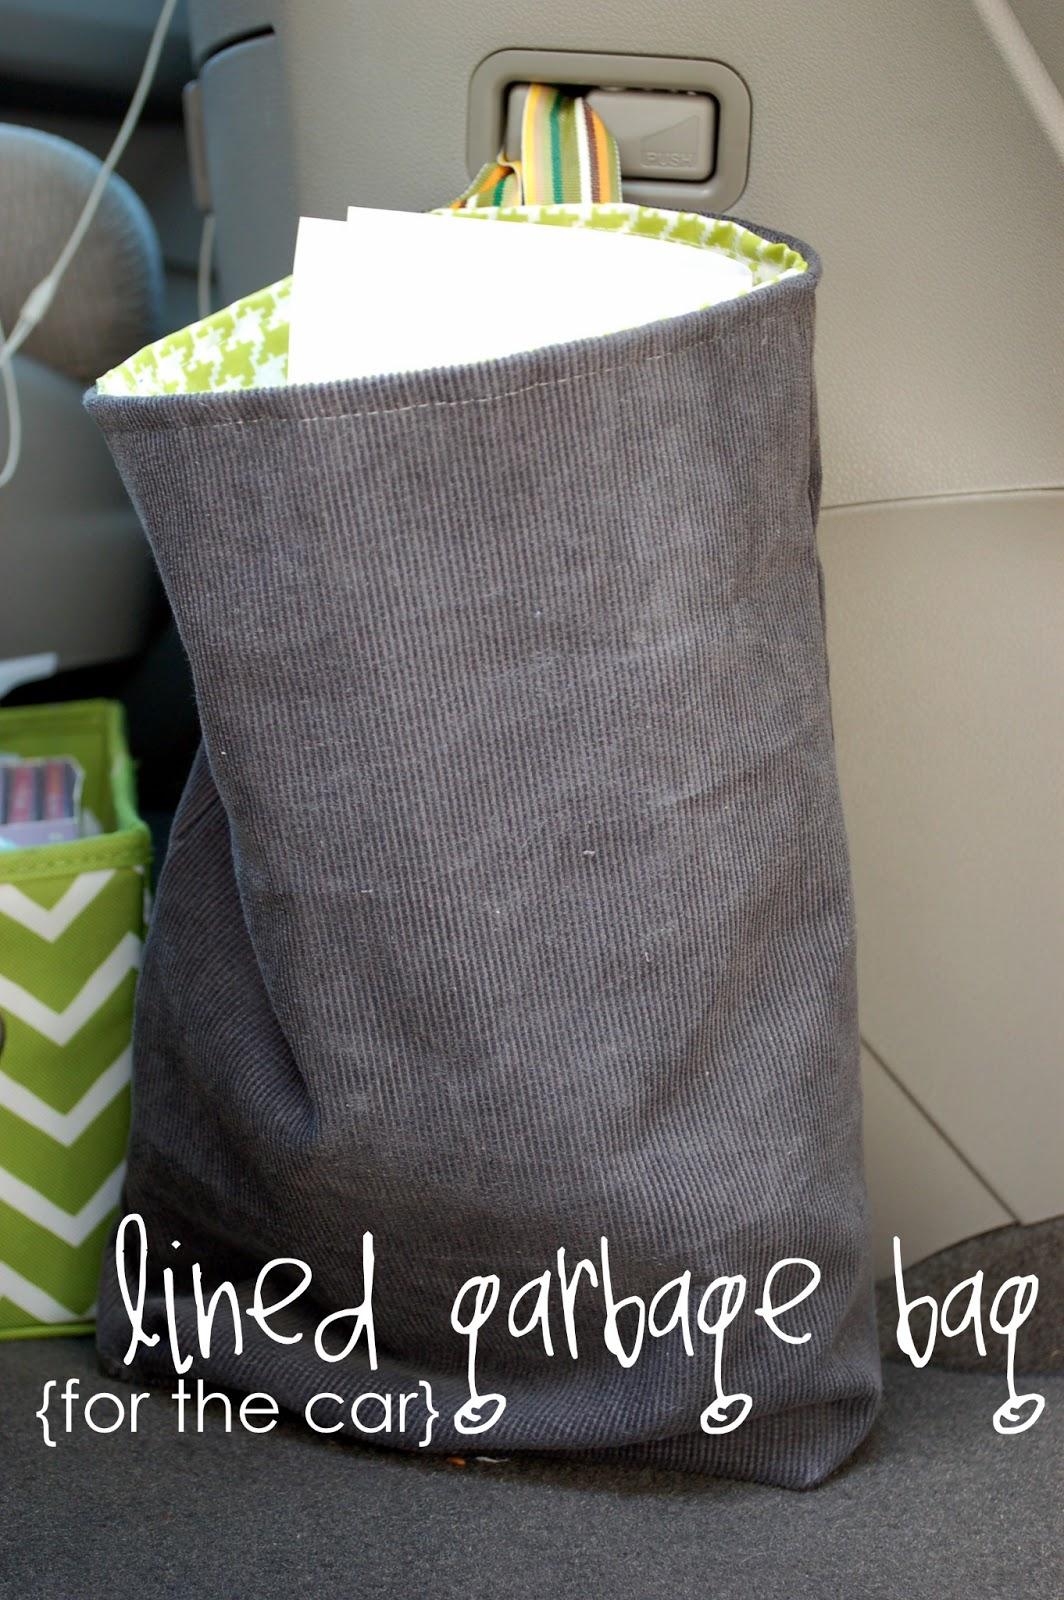 Lined Car Garbage Bag